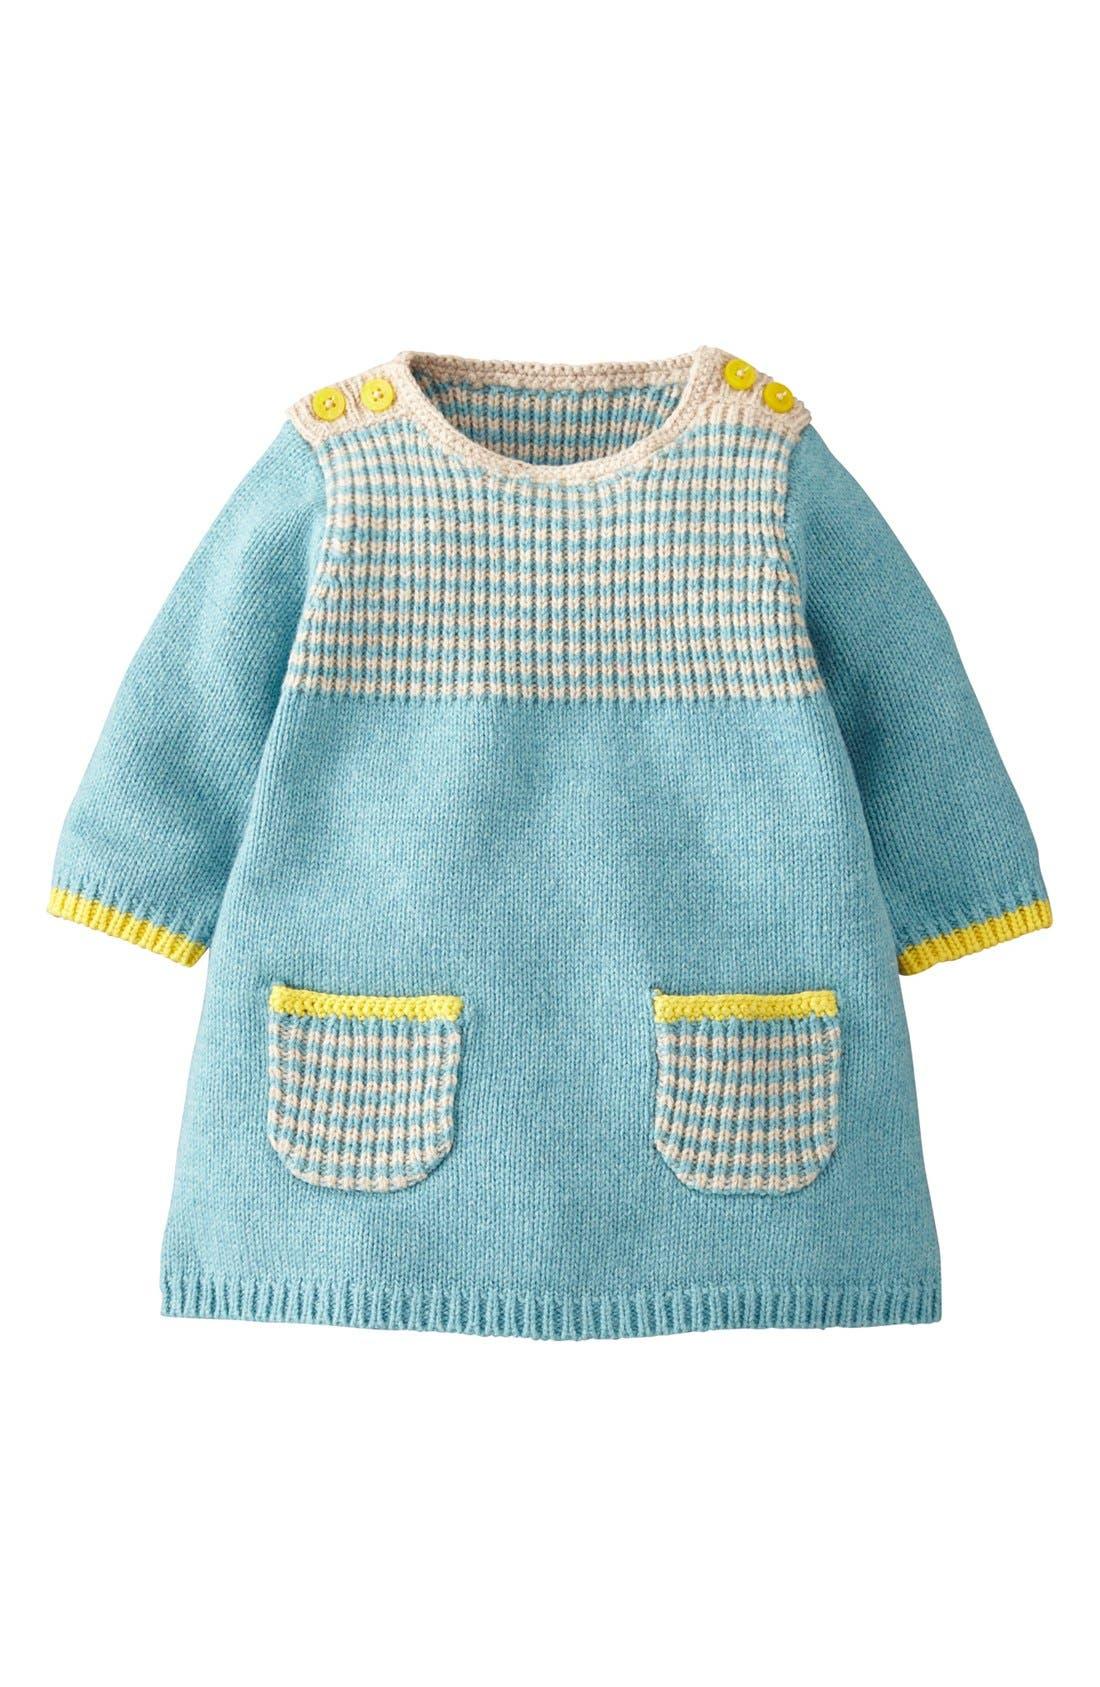 Main Image - Mini Boden 'Stripey' Knit Dress (Baby Girls)